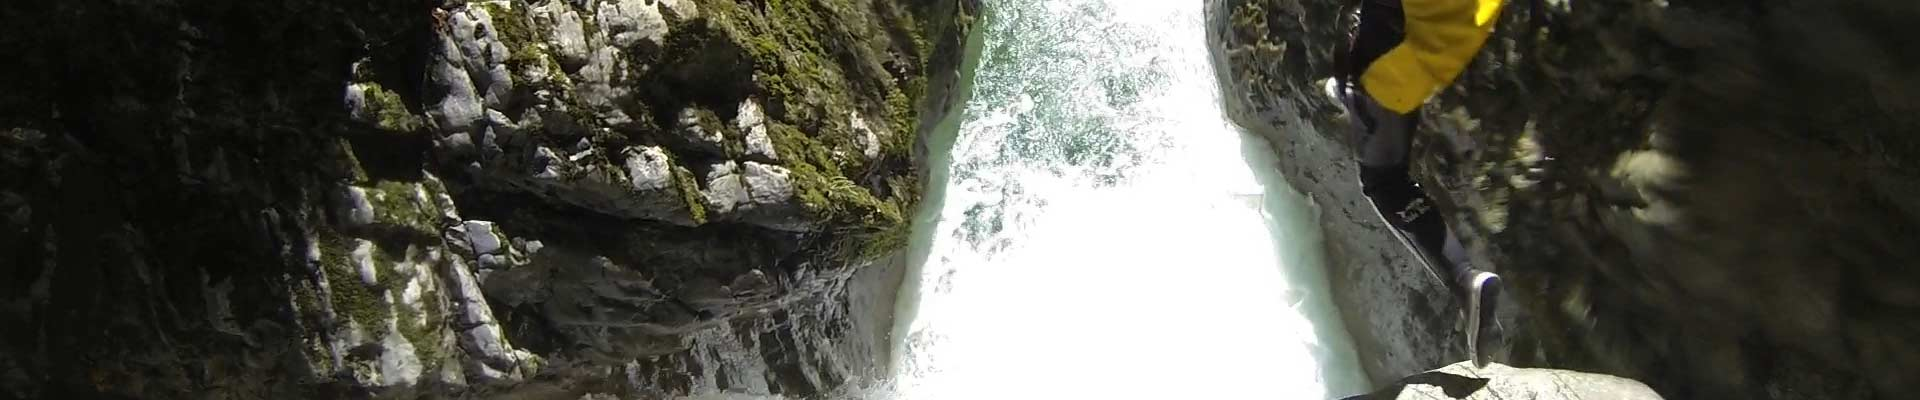 terreo-canyoning-sensation-2